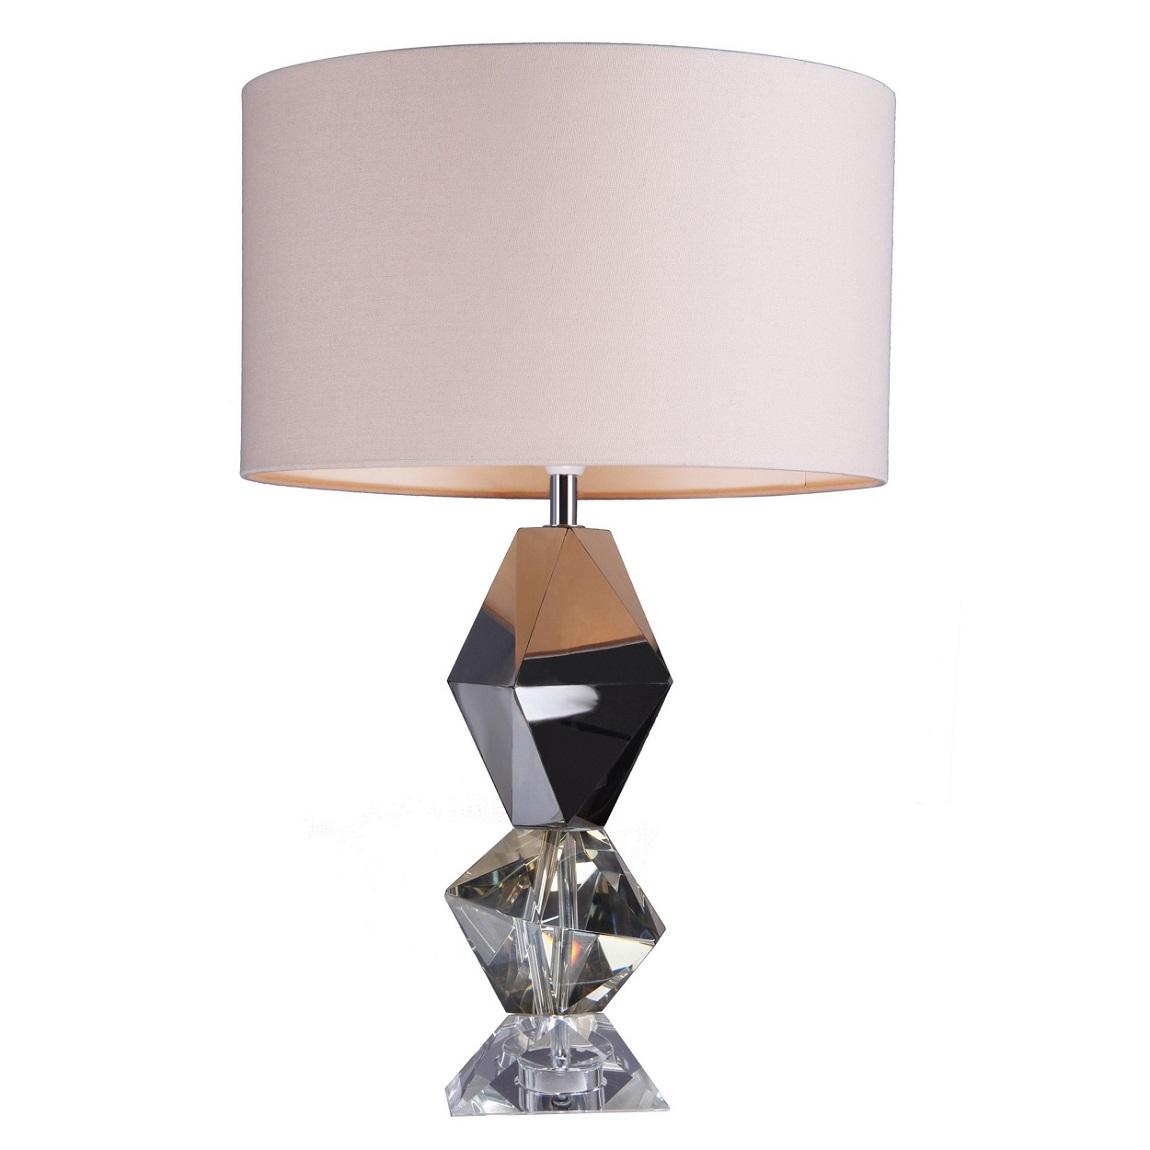 office table lamp. Sentinel Debenhams Home Collection \u0027Bailey\u0027 Table Lamp Contemporary Office Desk Light M